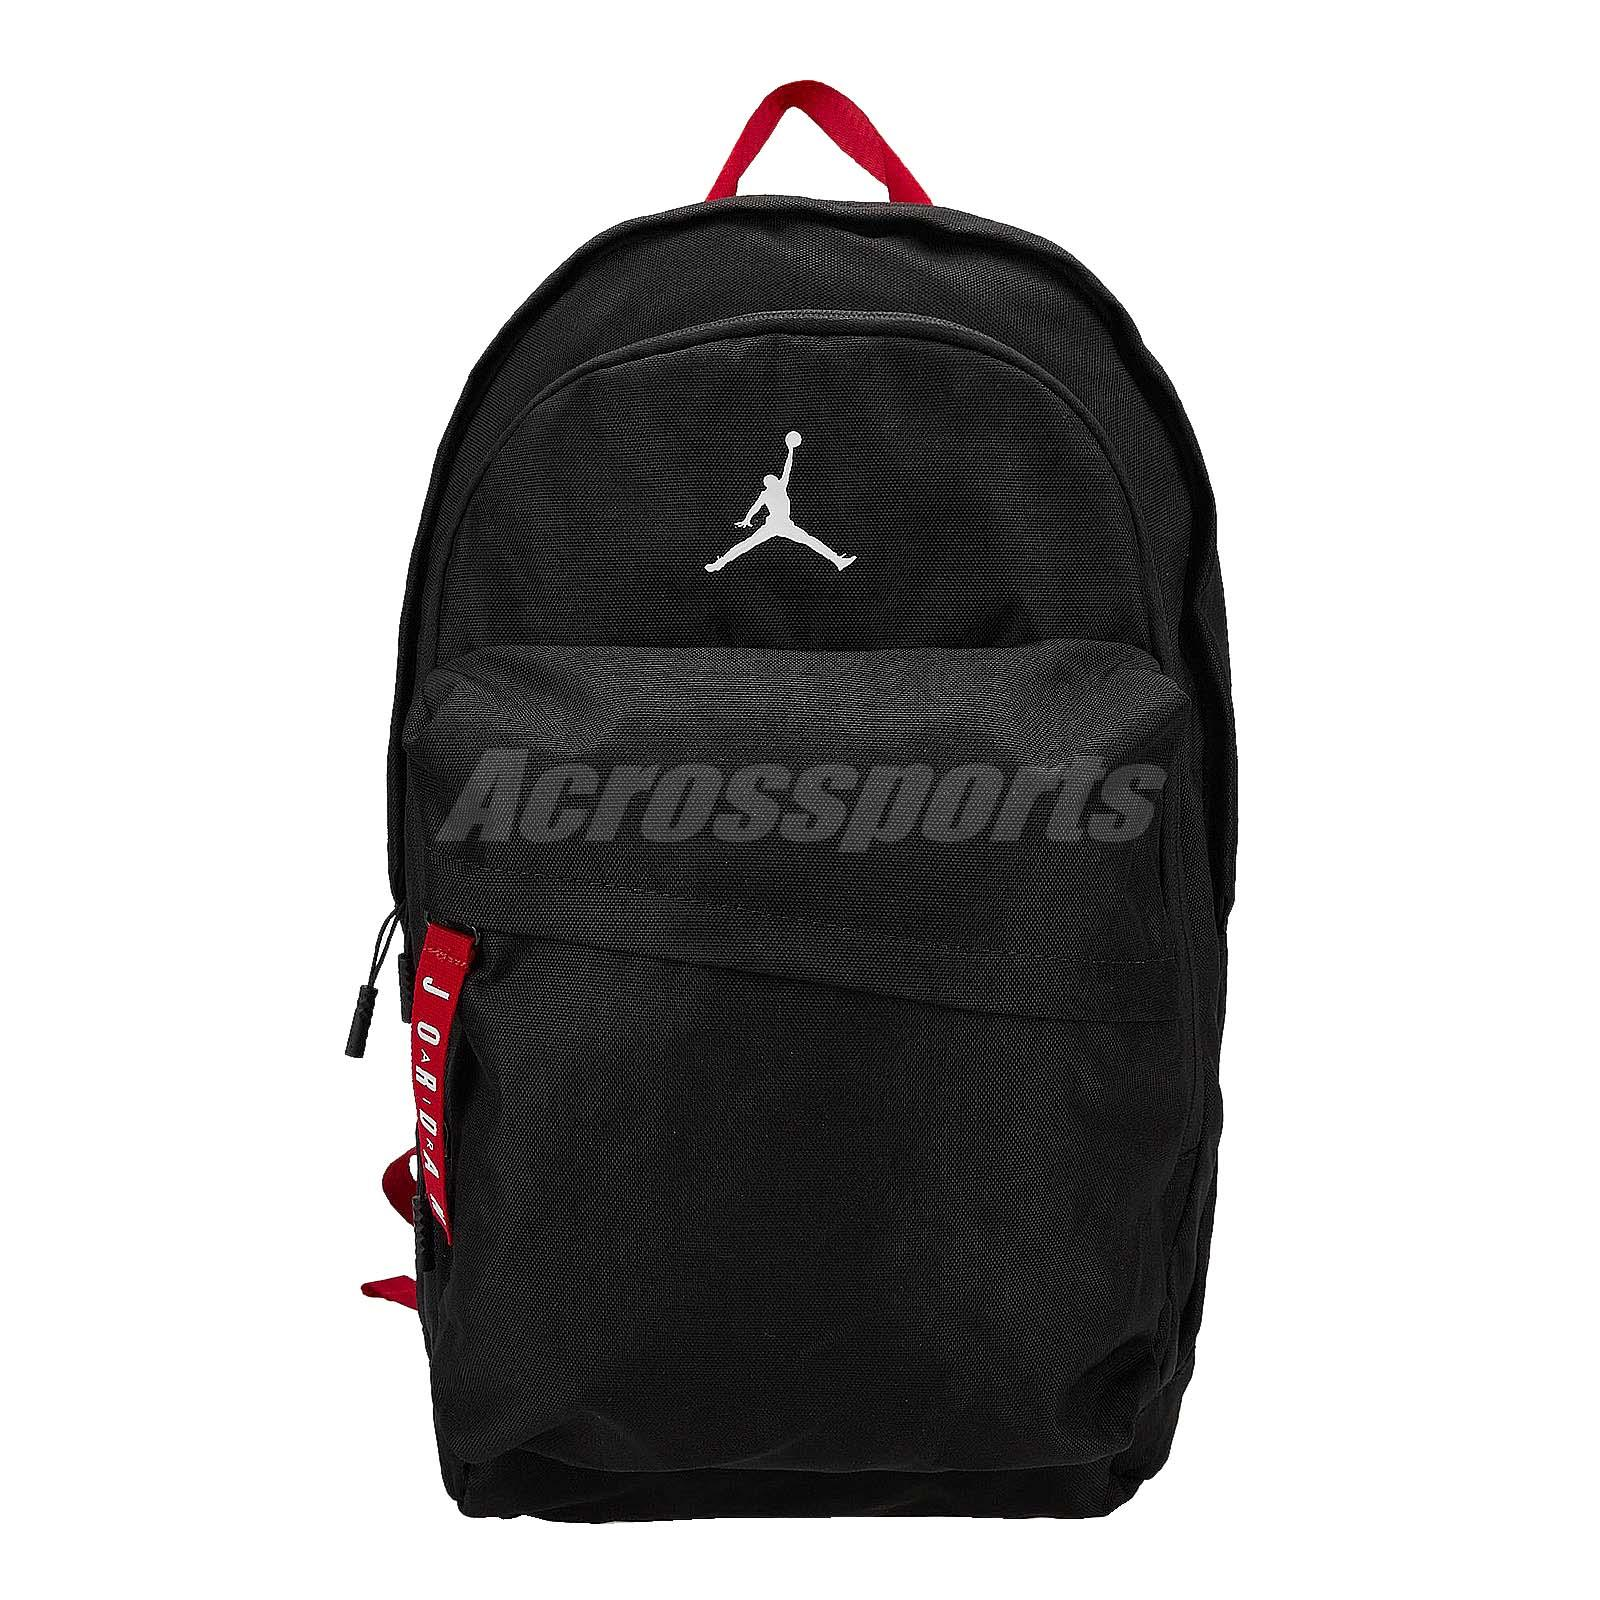 15a02216fb Nike Jordan Air Patrol Pack 27L Large Black White Red Backpack Bag ...